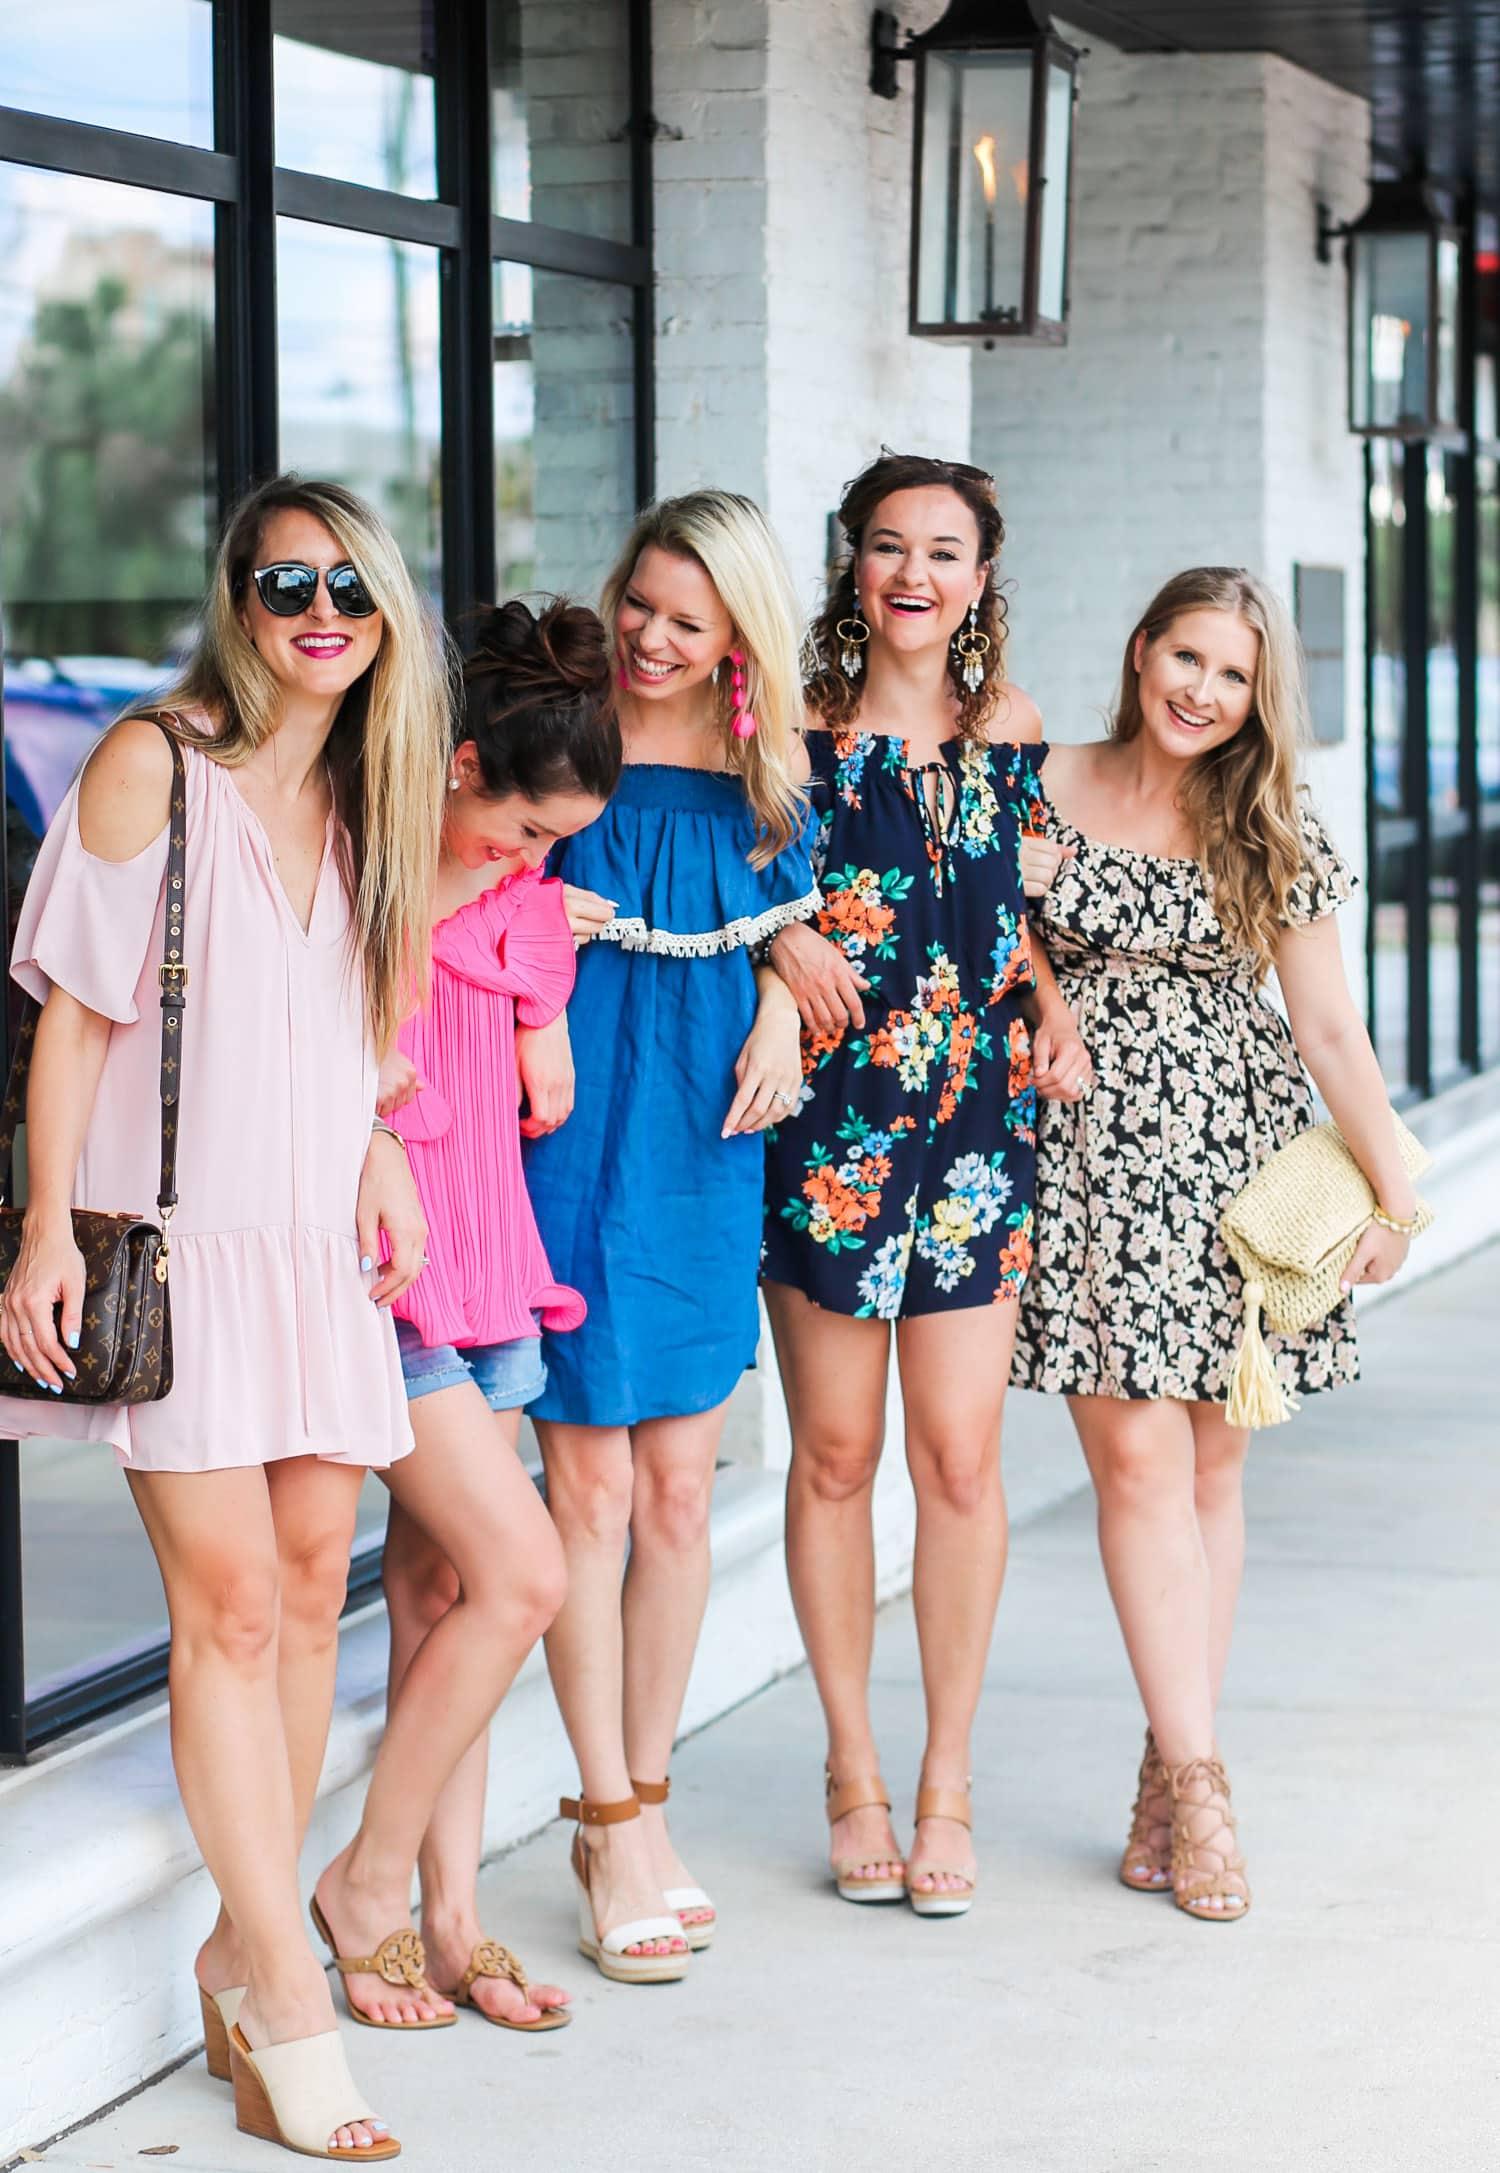 Orlando and Tampa fashion bloggers: Meet at The Barre, Diary of A Debutante, So Sarah Hunt, Mash Elle, Ashley Brooke Nicholas